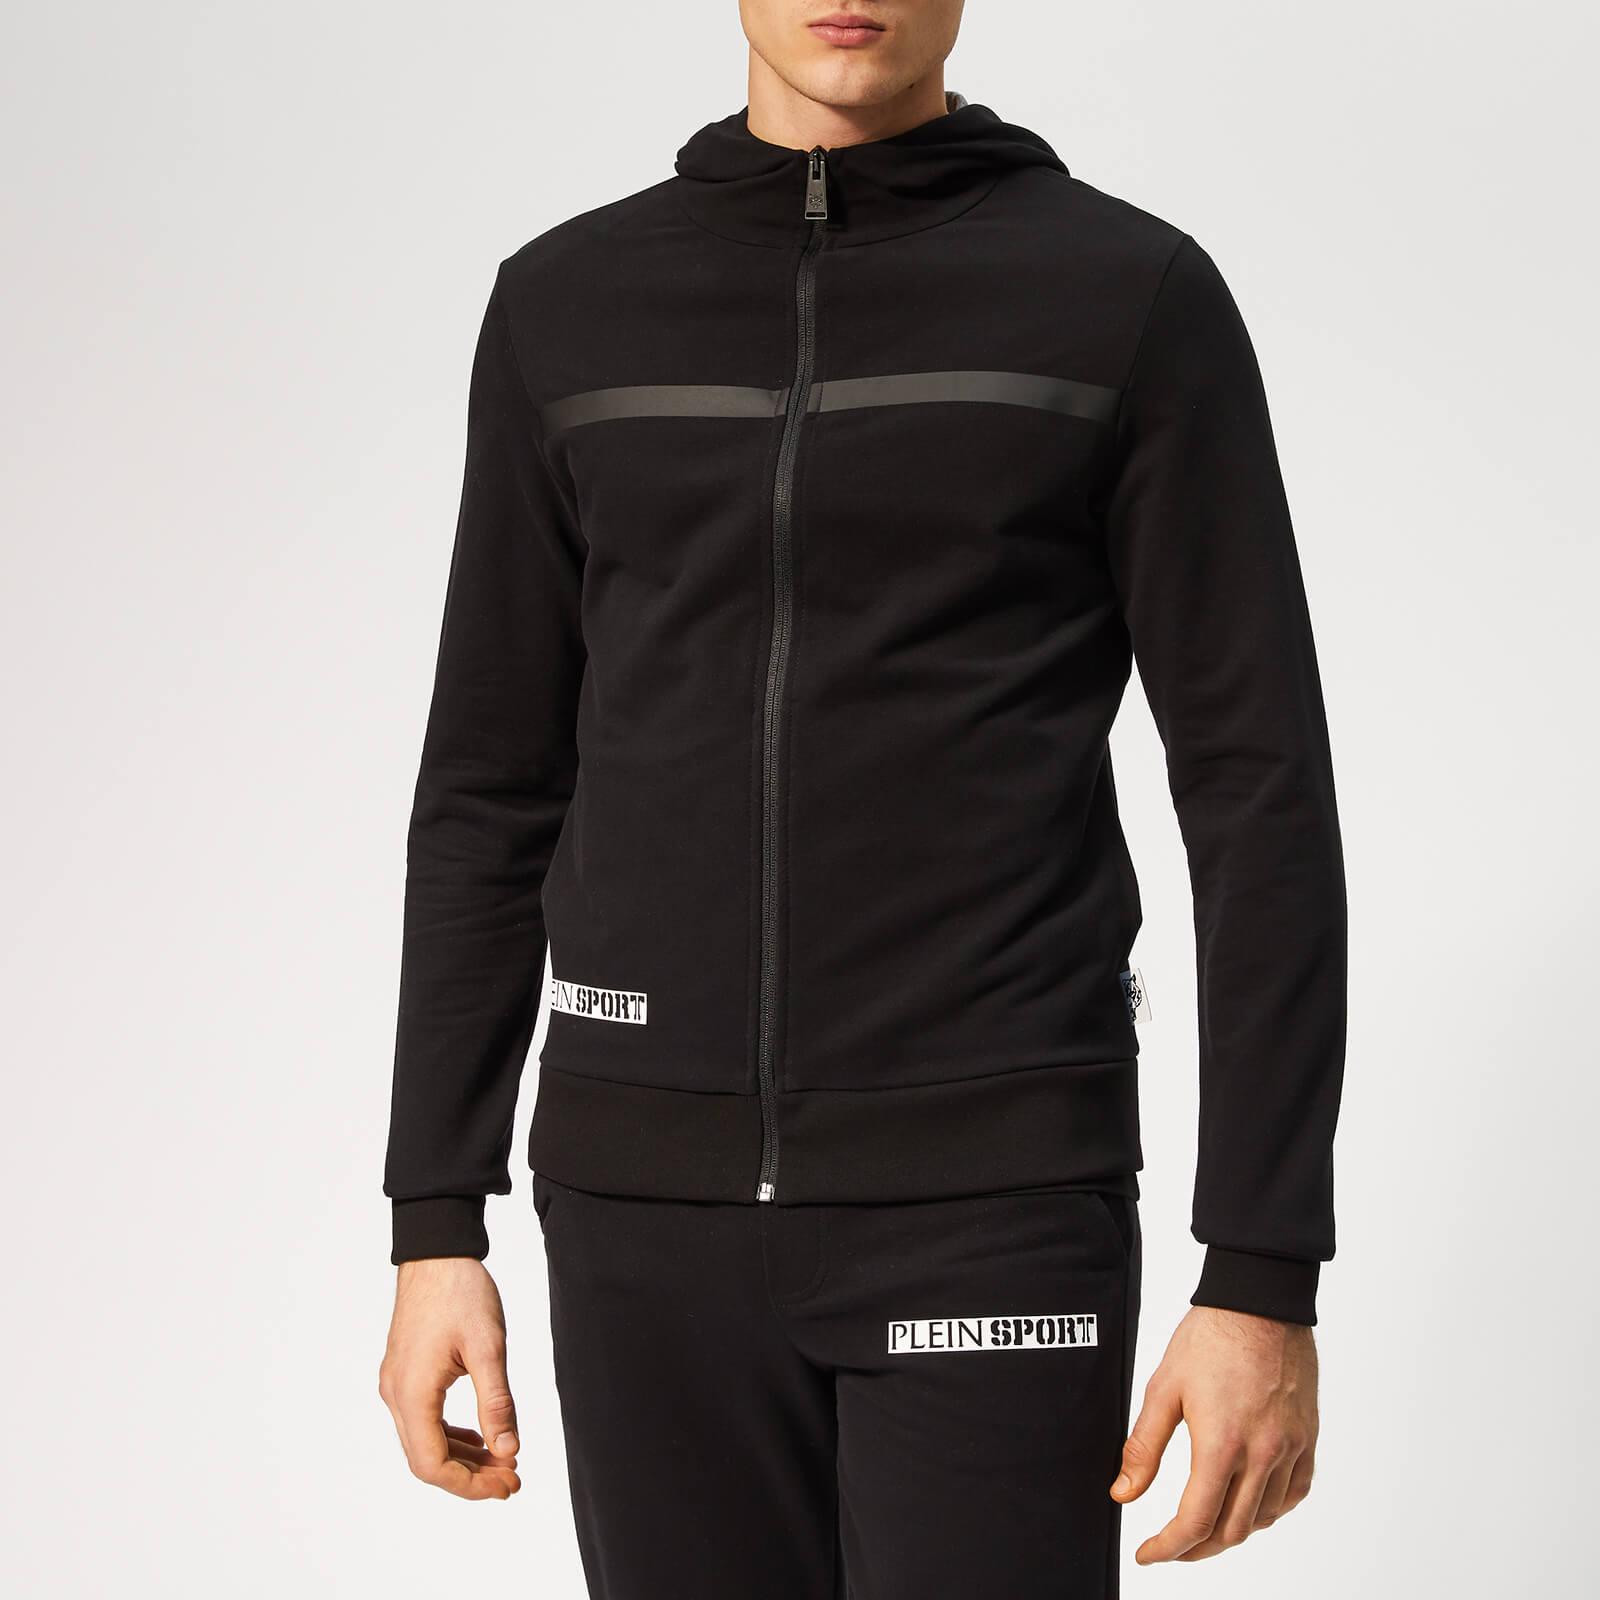 Plein Sport Men's Hooded Sweat Statement Jacket - Black - S - Black